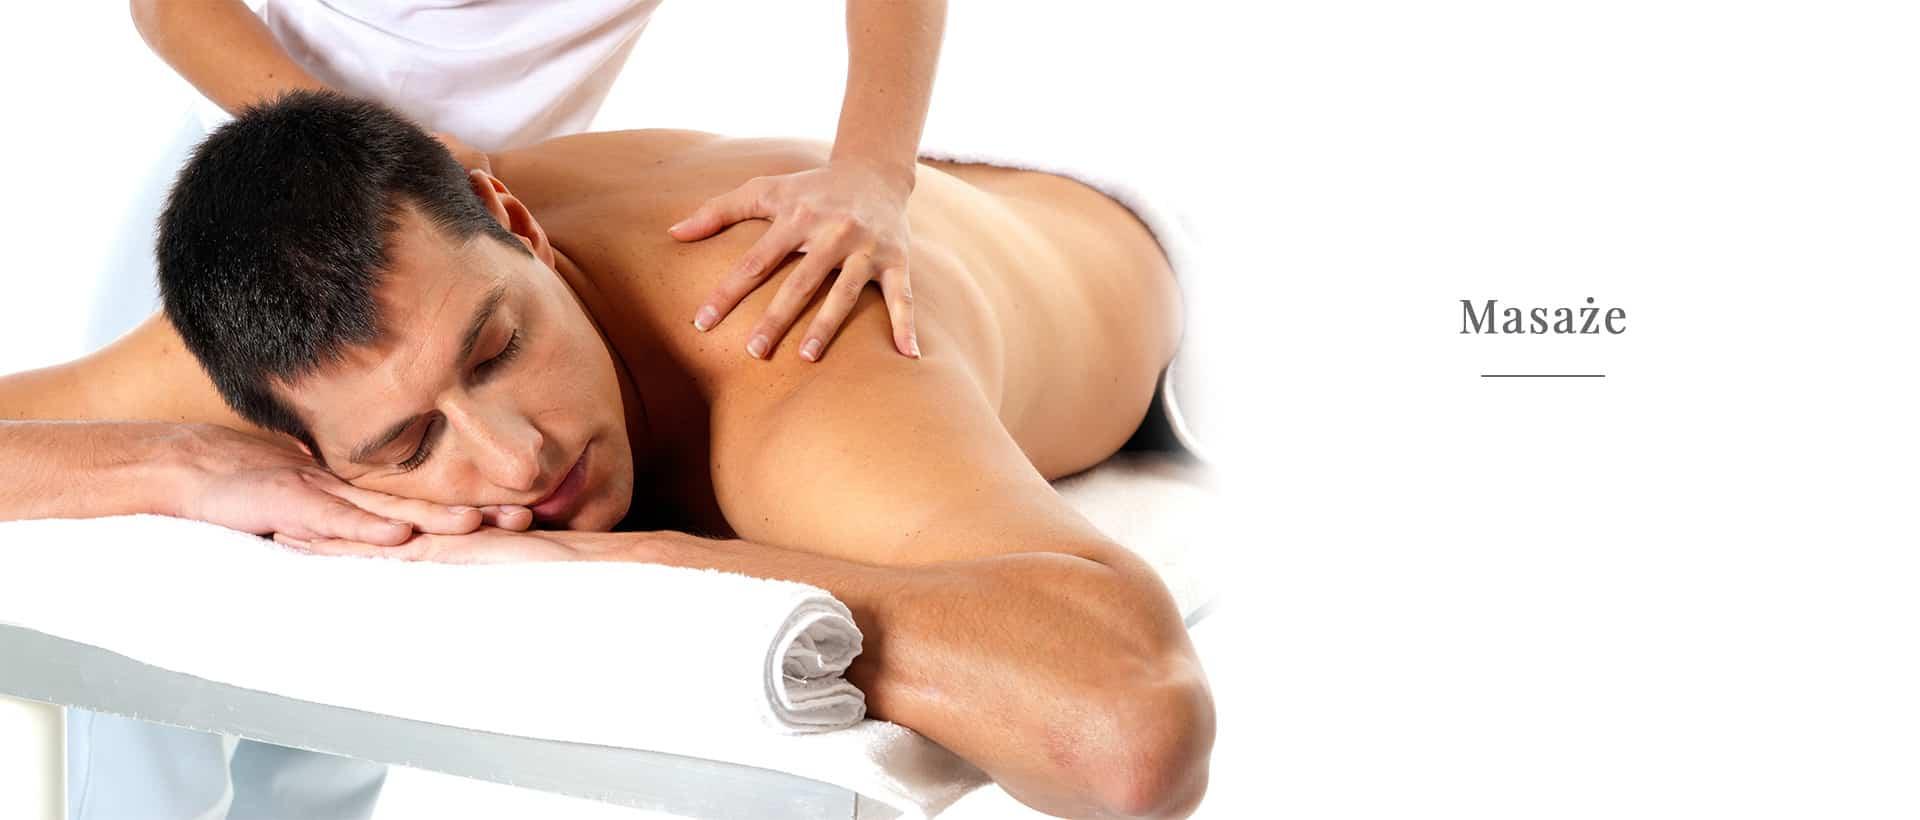 masaze-rosamed-clinic